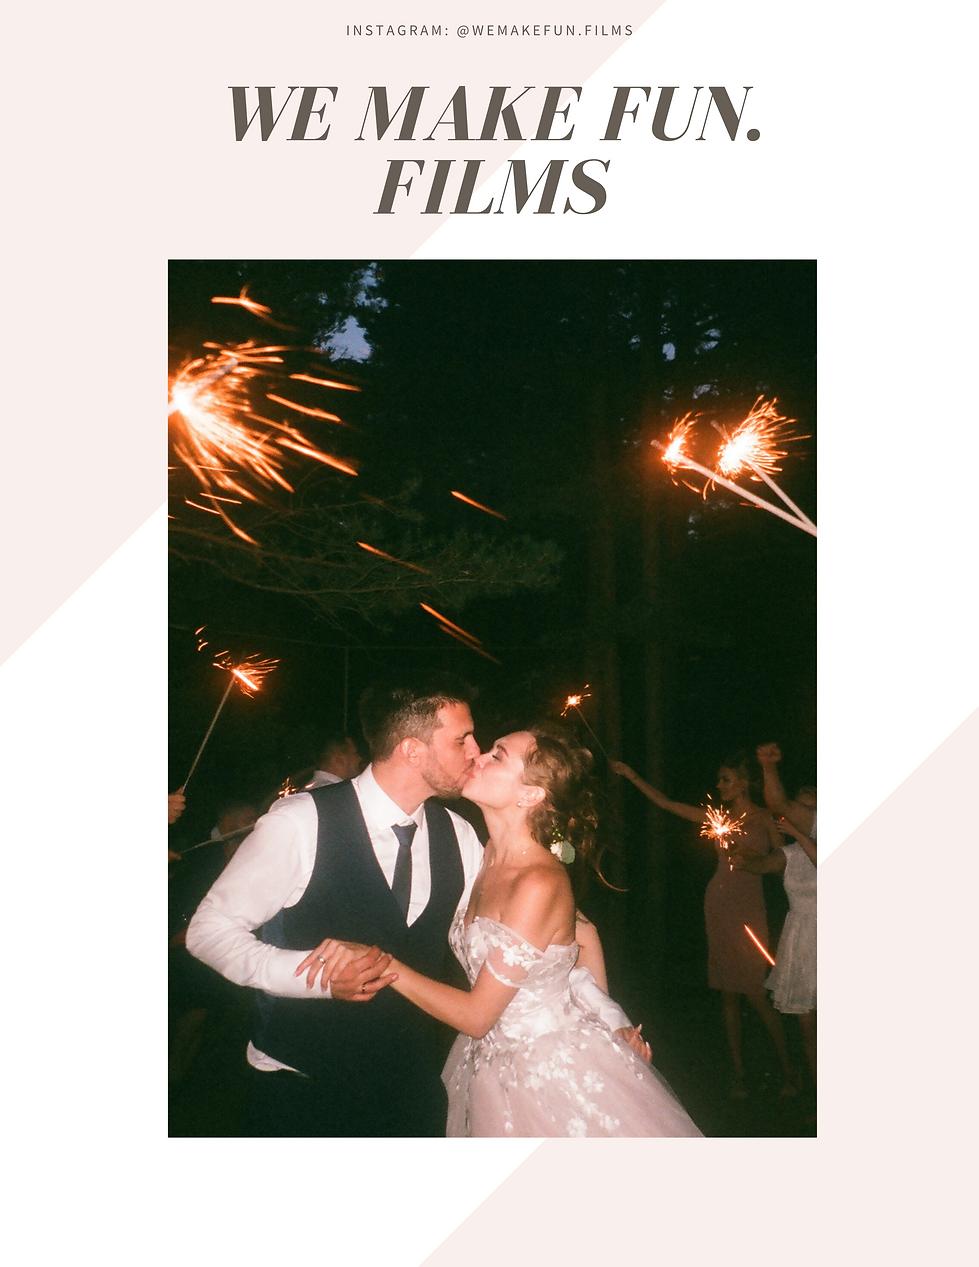 We Make Fun Films 2022 Videography Pricing.png